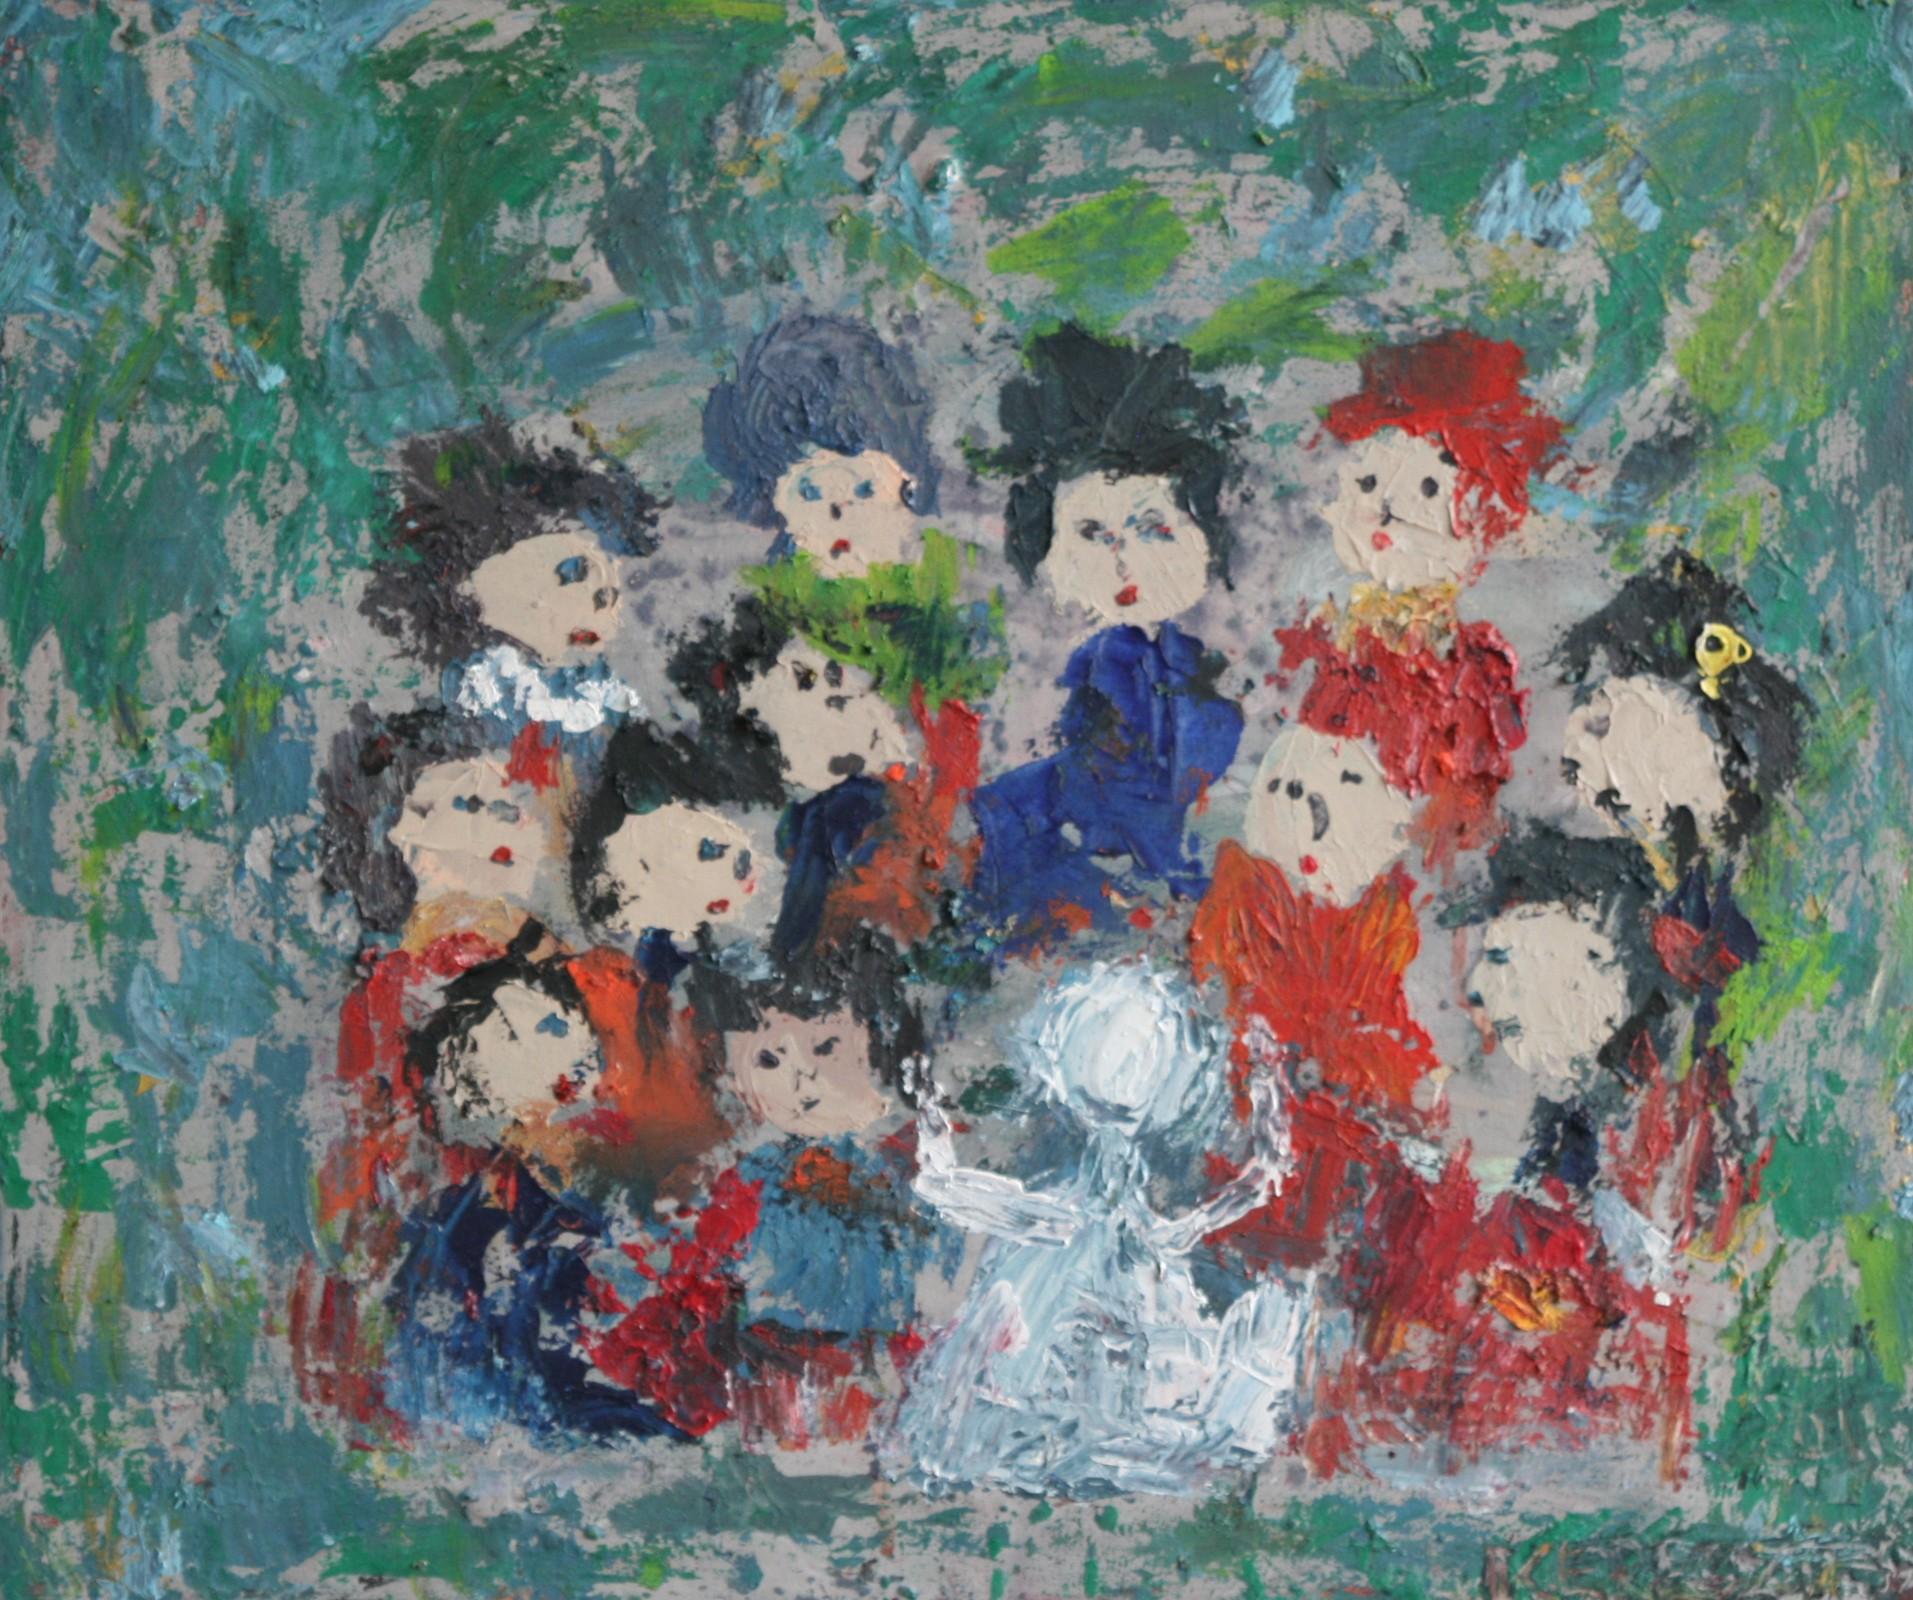 toile 82 - magdalena keresztes, artiste peintre à amiens